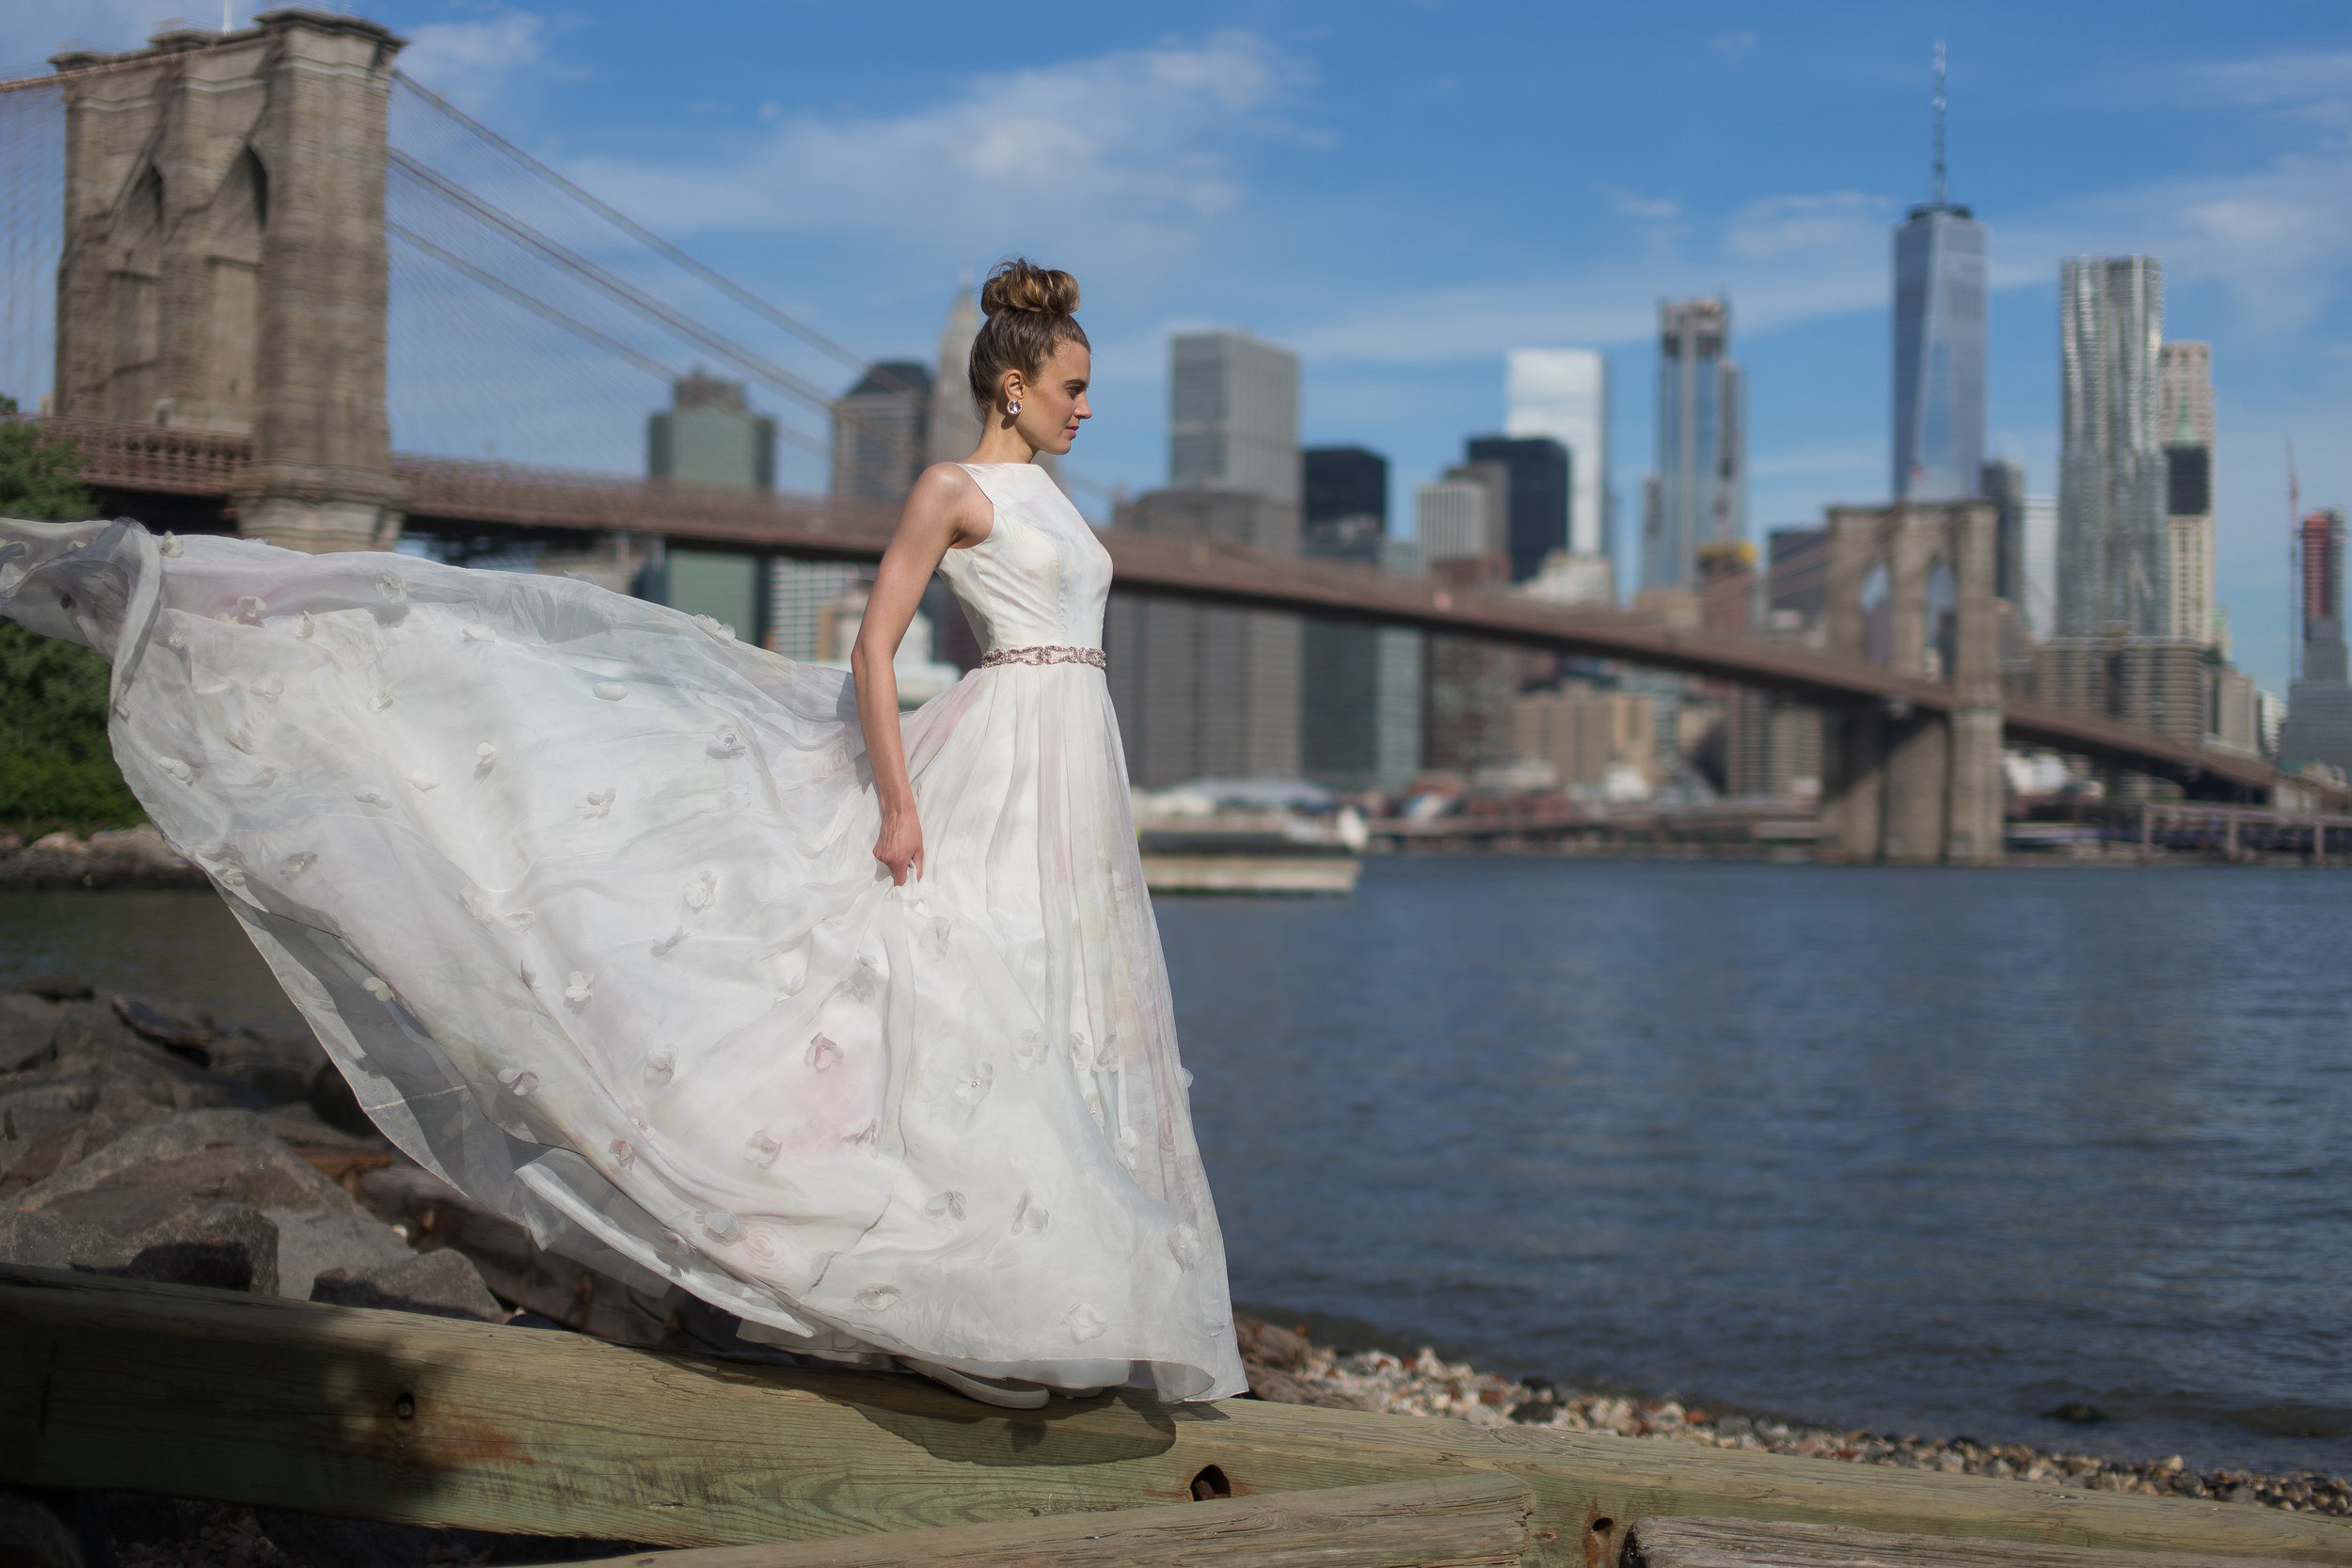 Bredice_beauty_hmua_LYB_NYC_by_Jan_Freire-5229.jpg